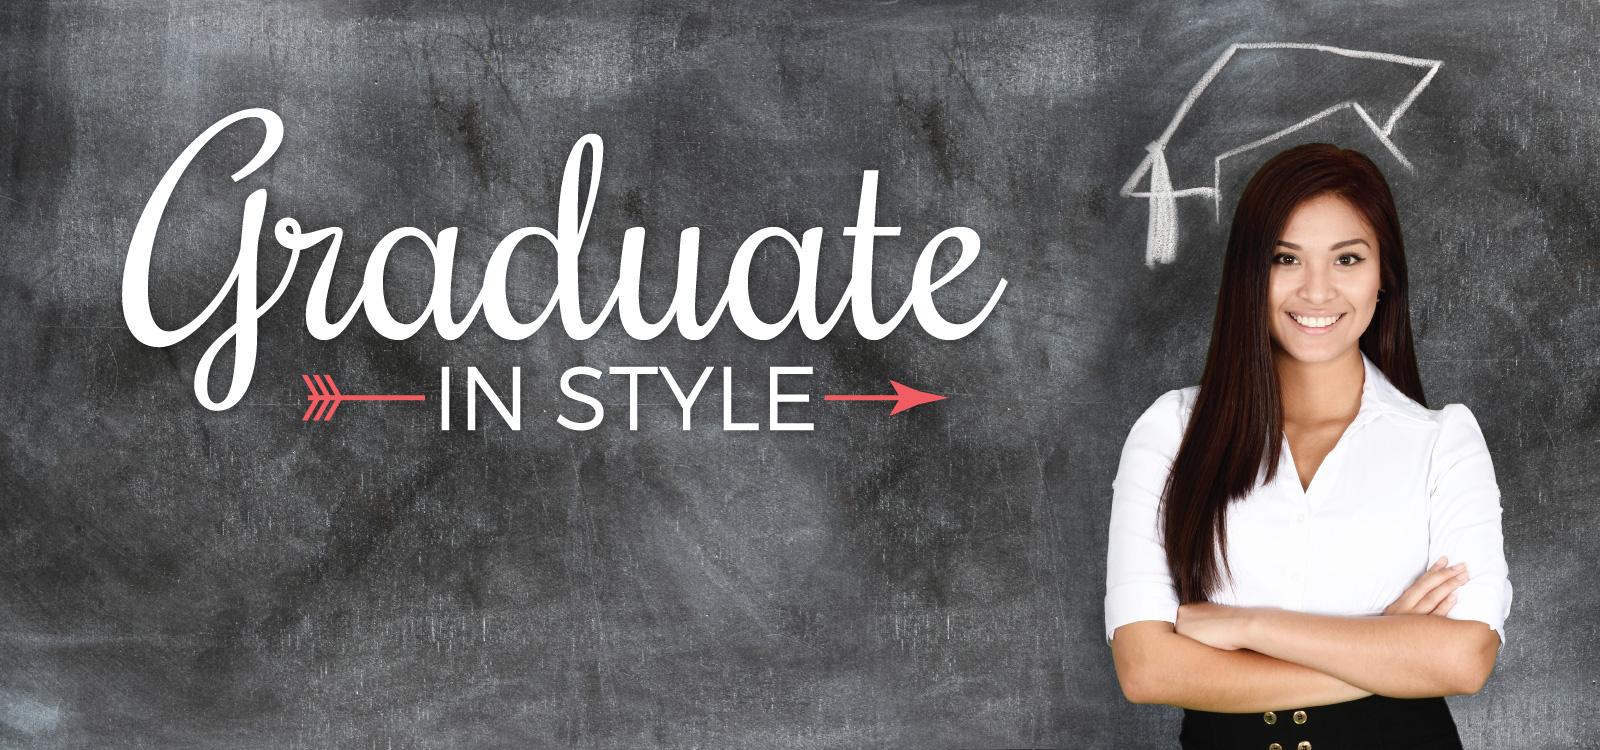 GraduateInStyle_WebsiteSLide_1600X750_Chalkboard_0316